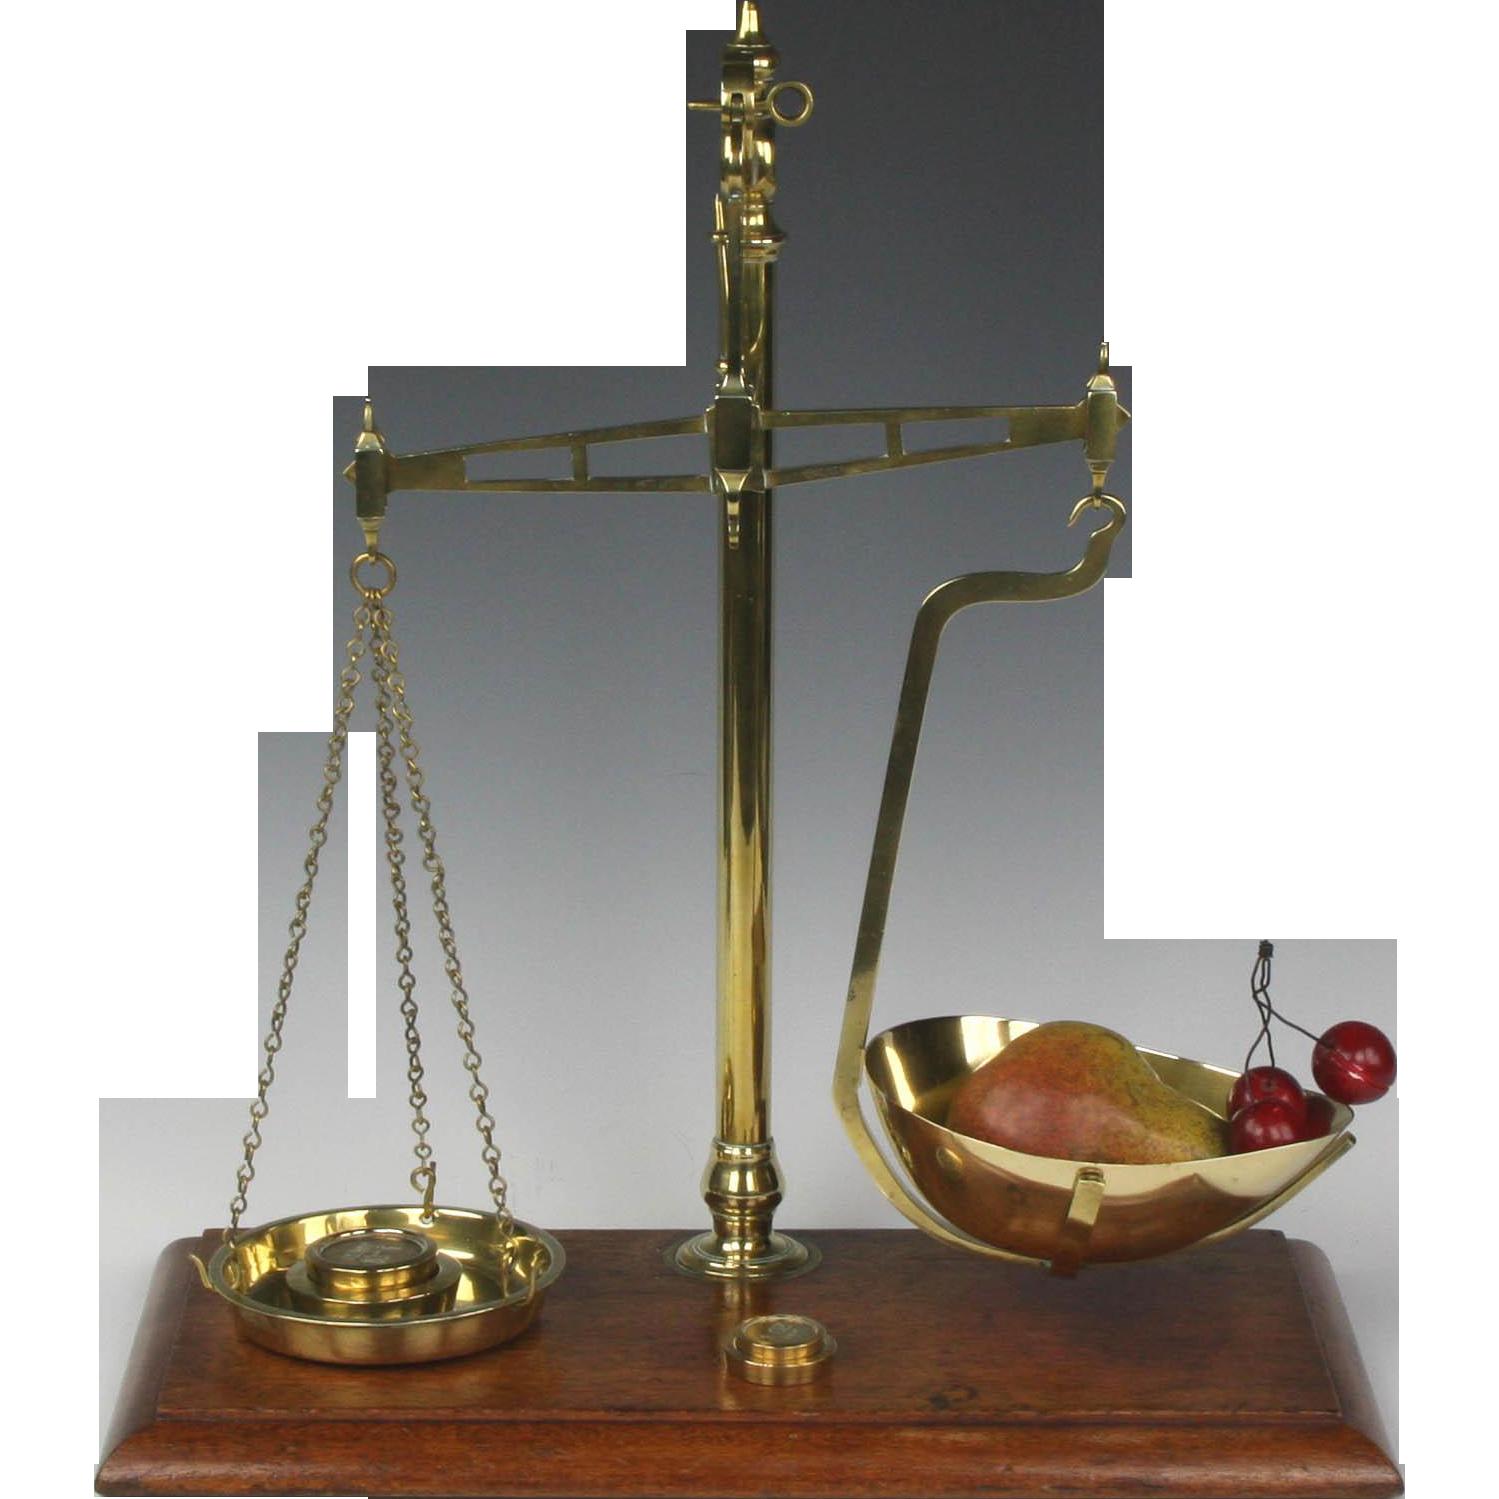 pan balance scale - photo #7